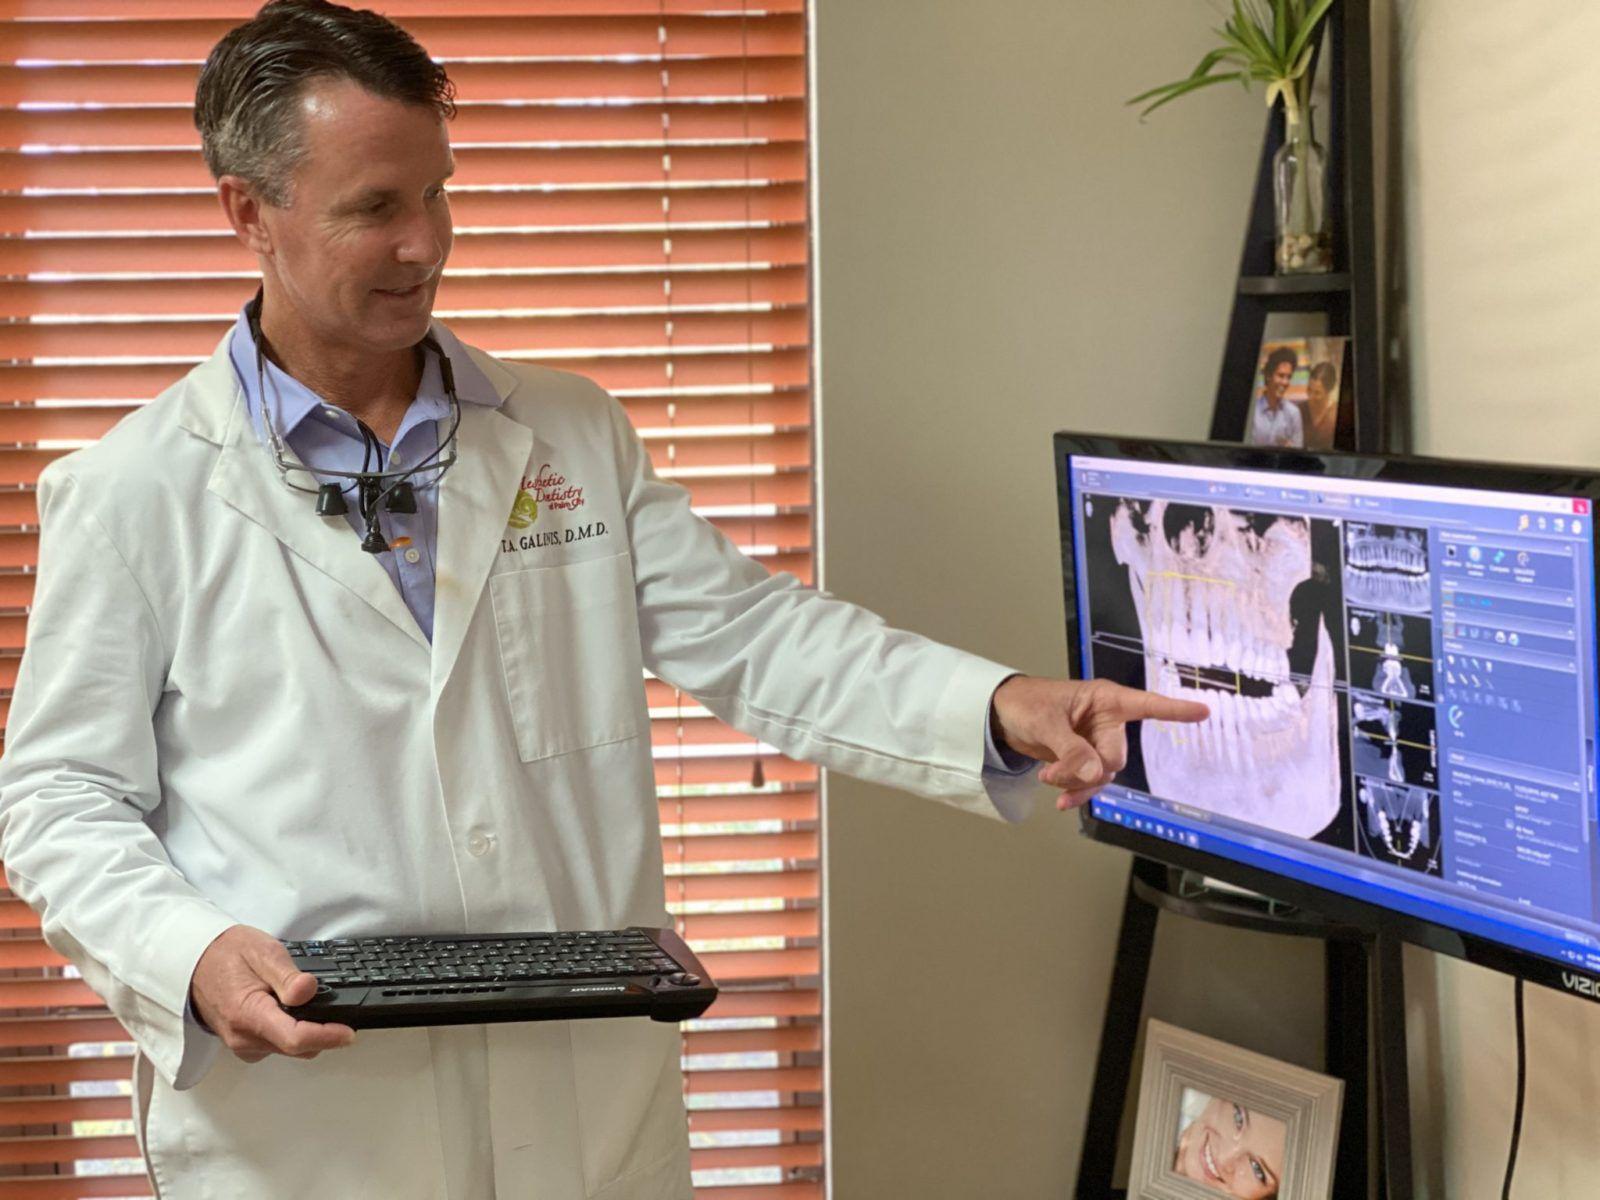 Dr. Tom Galinis explaining dental treatment